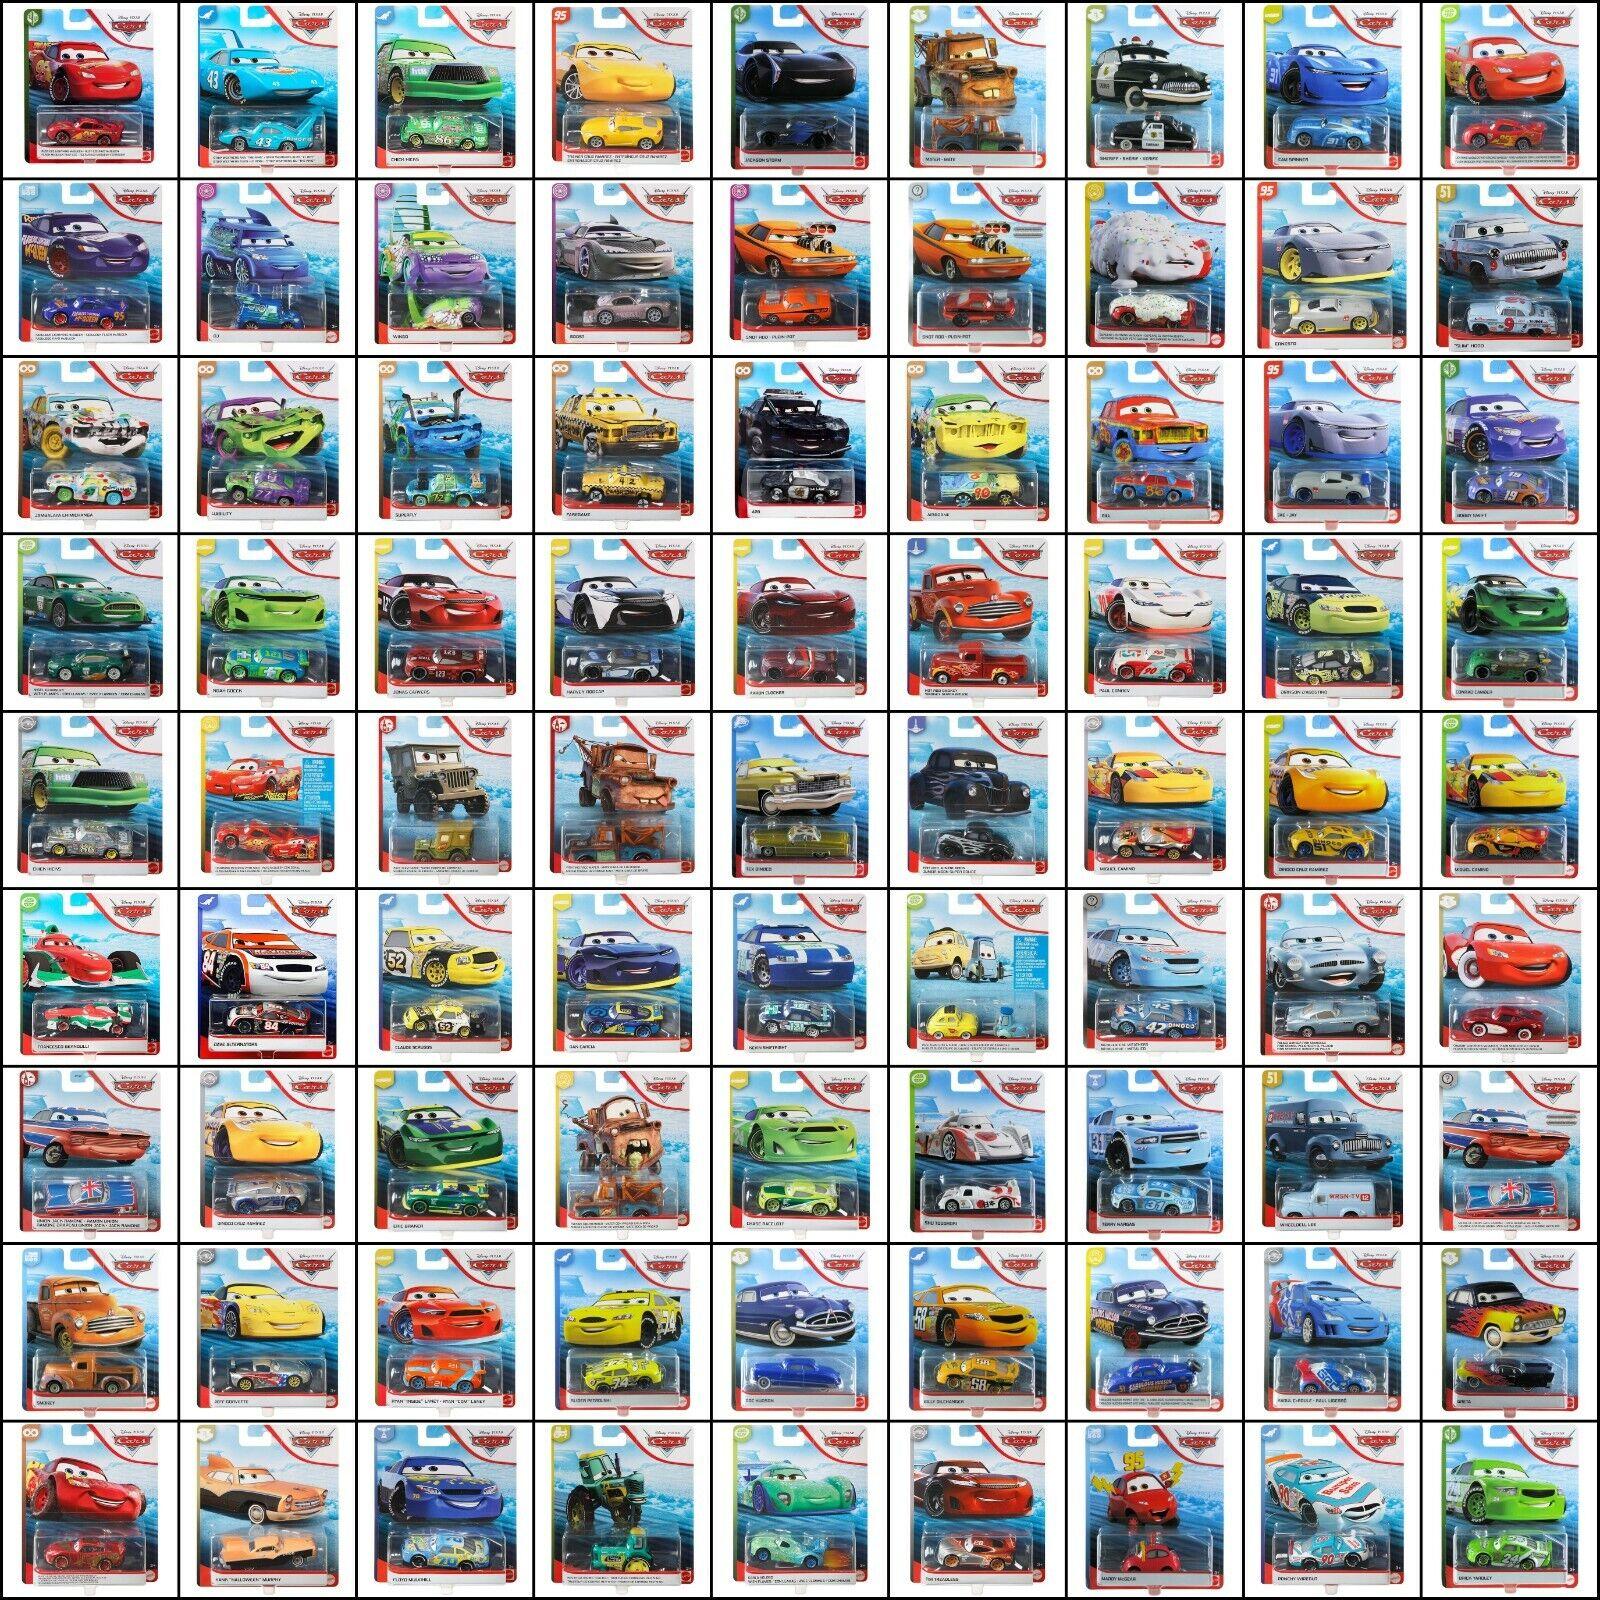 Disney Pixar Cars 2020 Mattel 155 Scale Diecast Assortment Choose